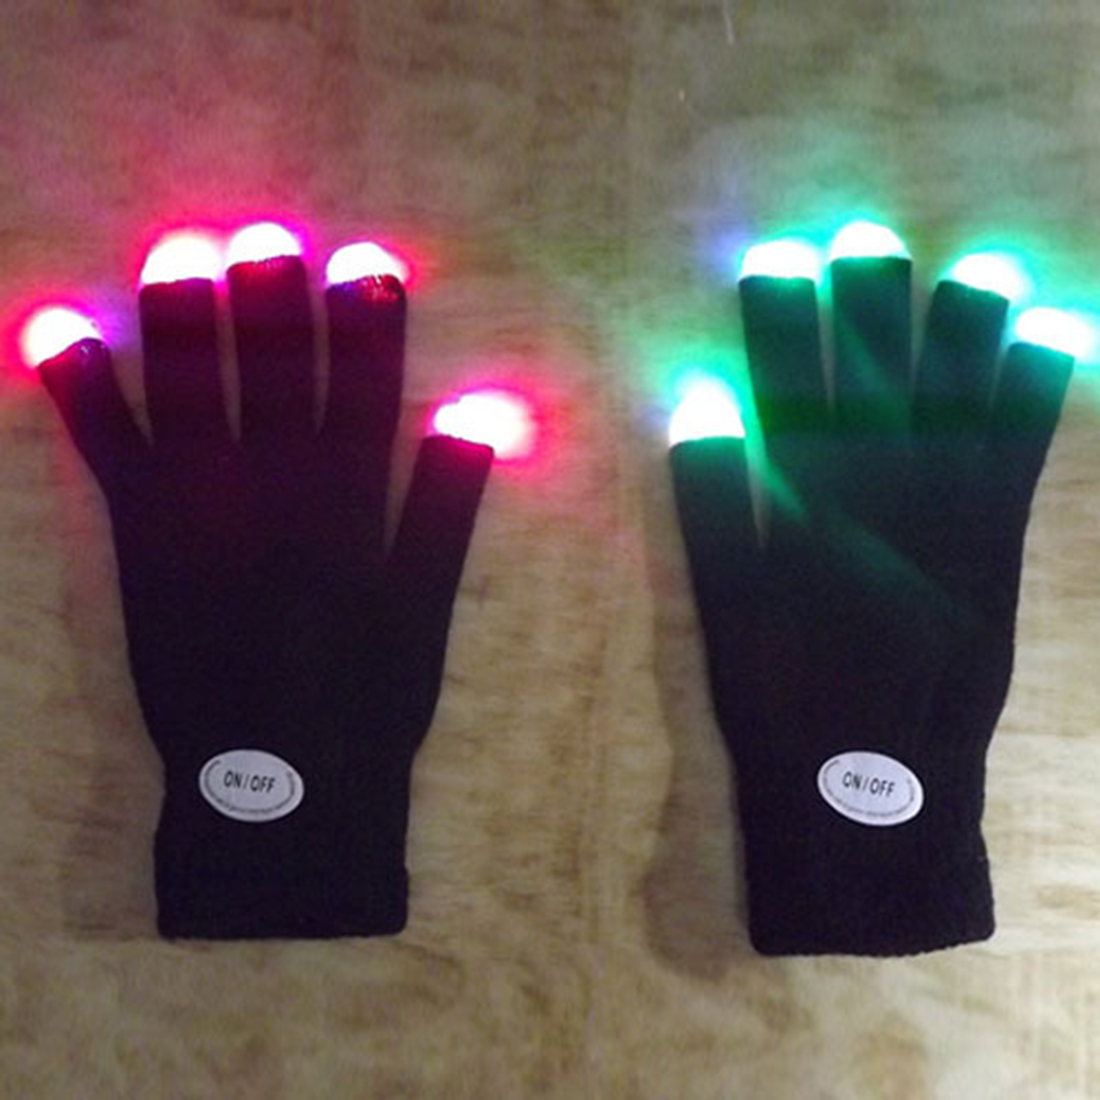 Self-Conscious Magic Flash Fingertip Led Gloves Unisex Light Up Glow Stick Gloves Mittens Fingertip Led Luminous Gloves Men's Gloves